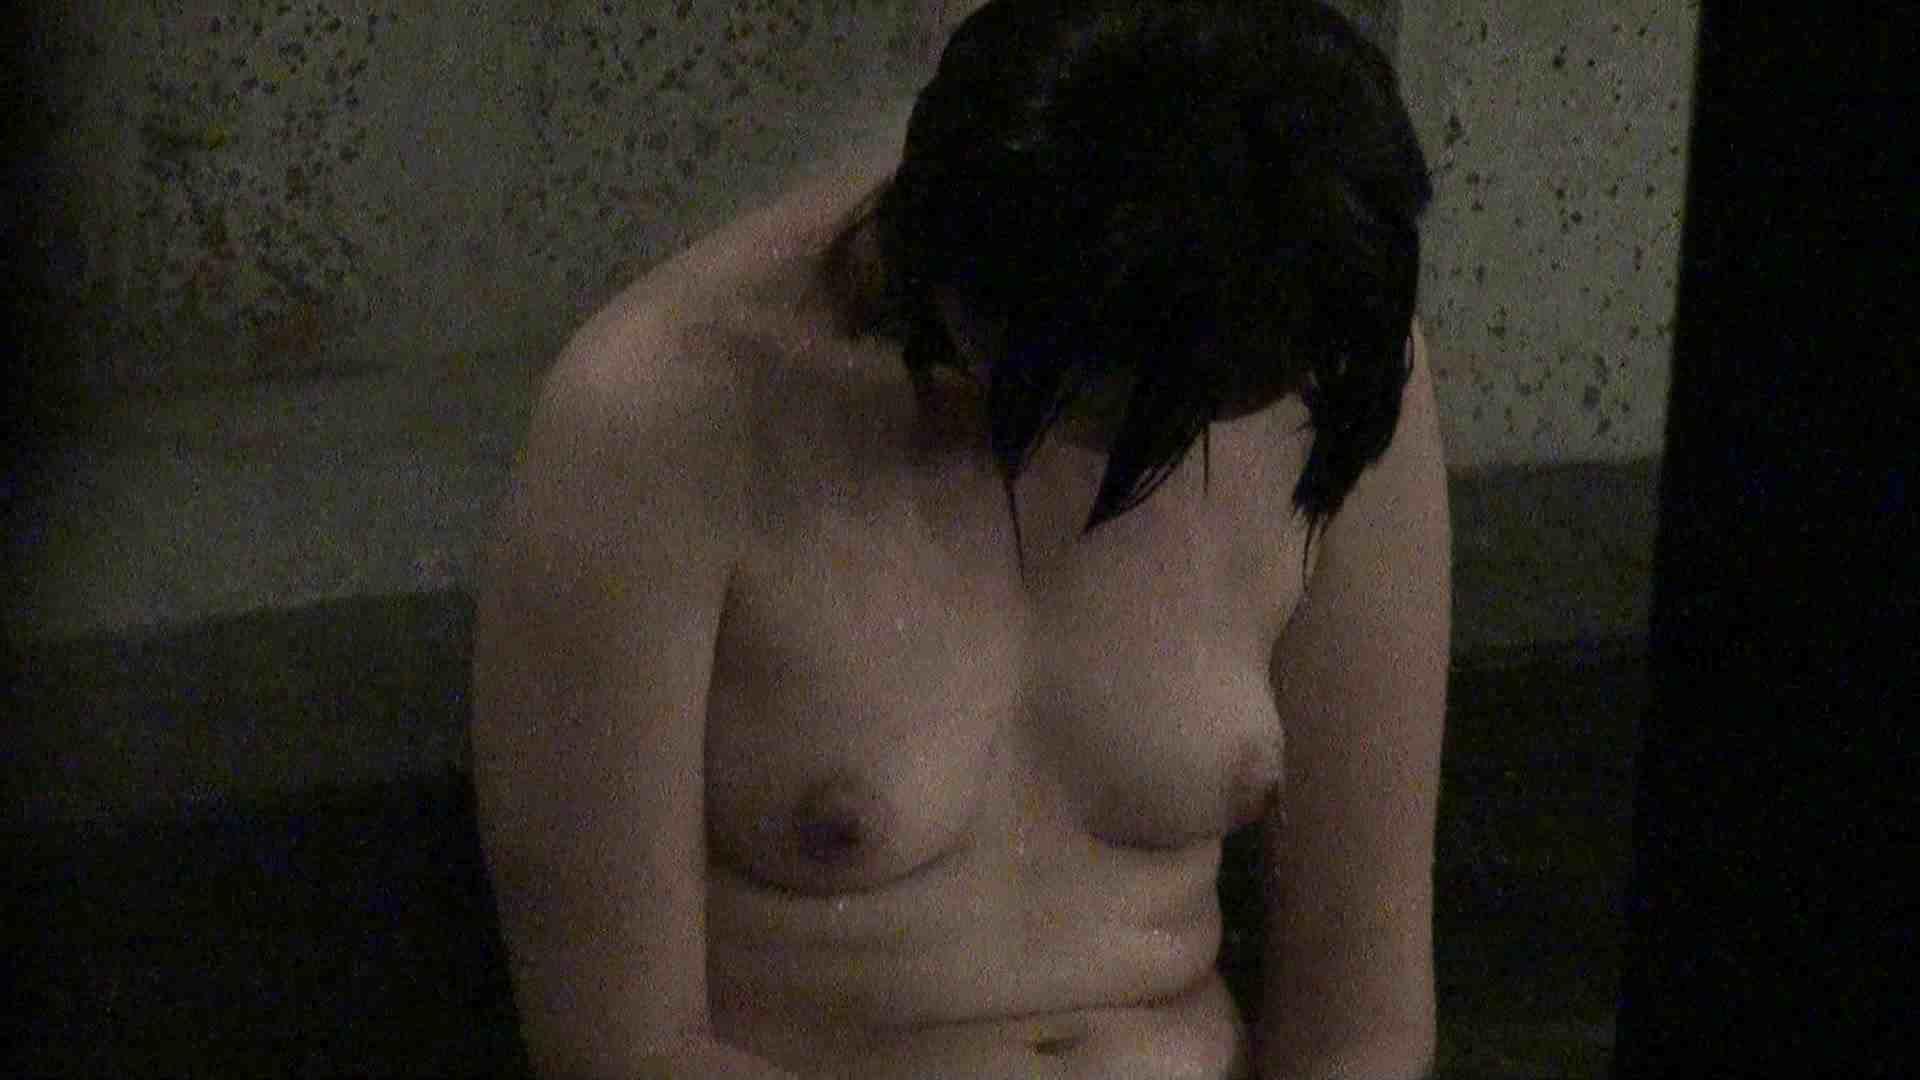 Aquaな露天風呂Vol.369 露天風呂 ワレメ動画紹介 108連発 86